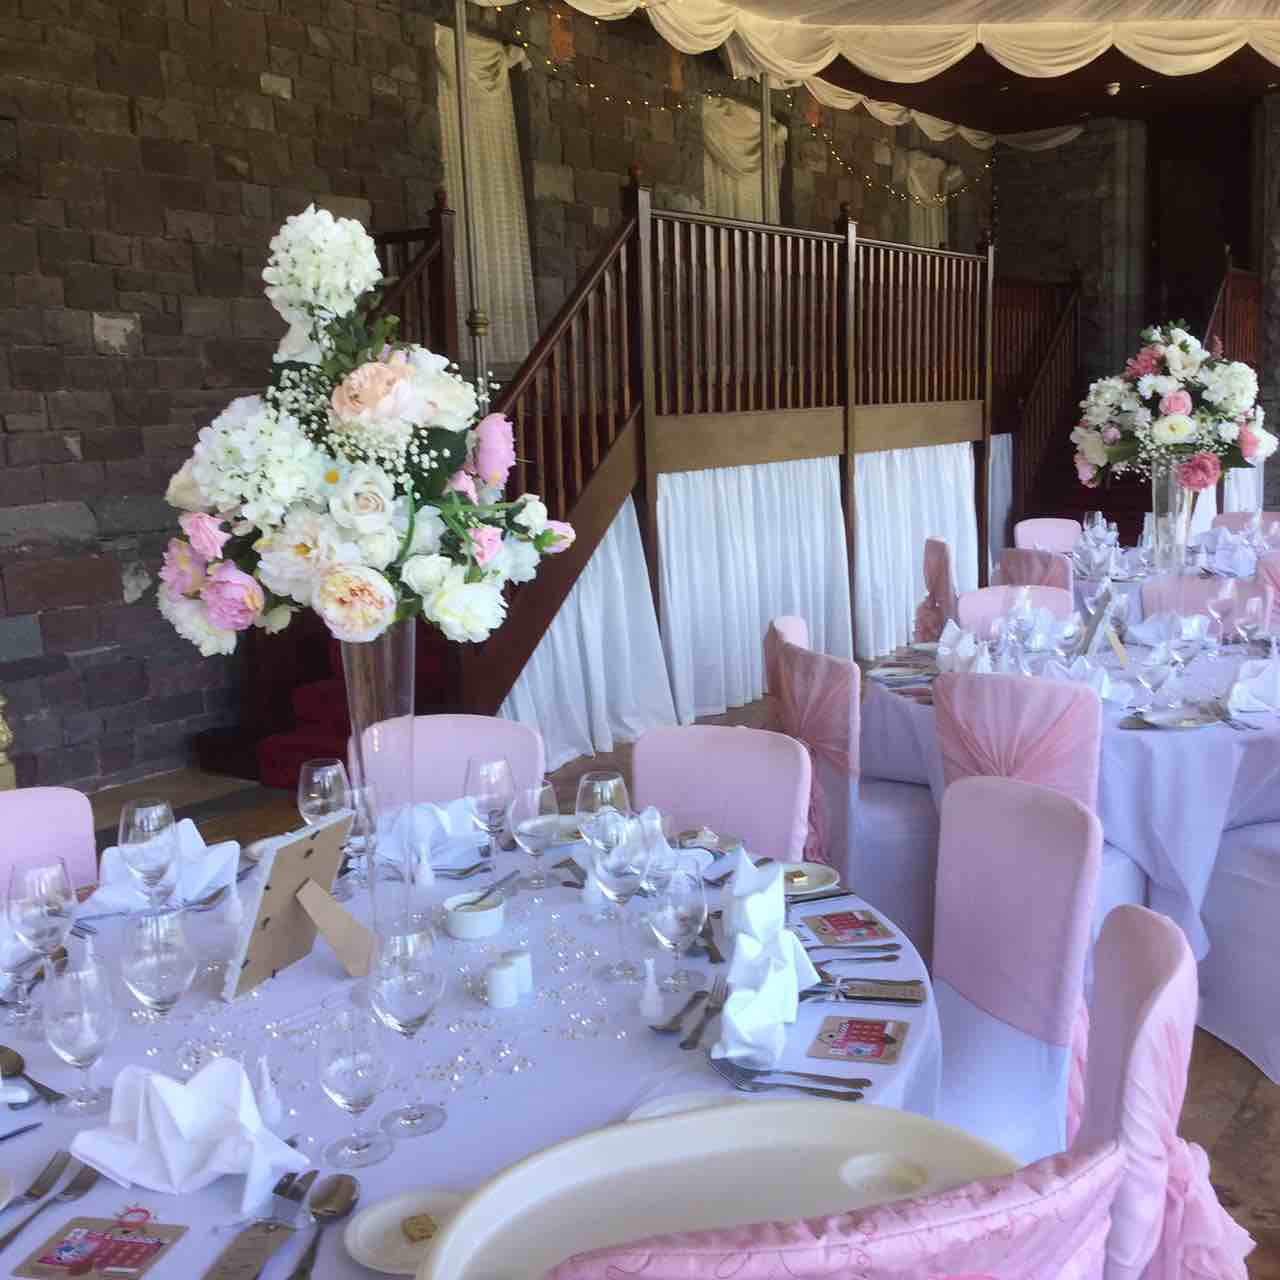 White Castle Wedding: Self-Catering Weddings